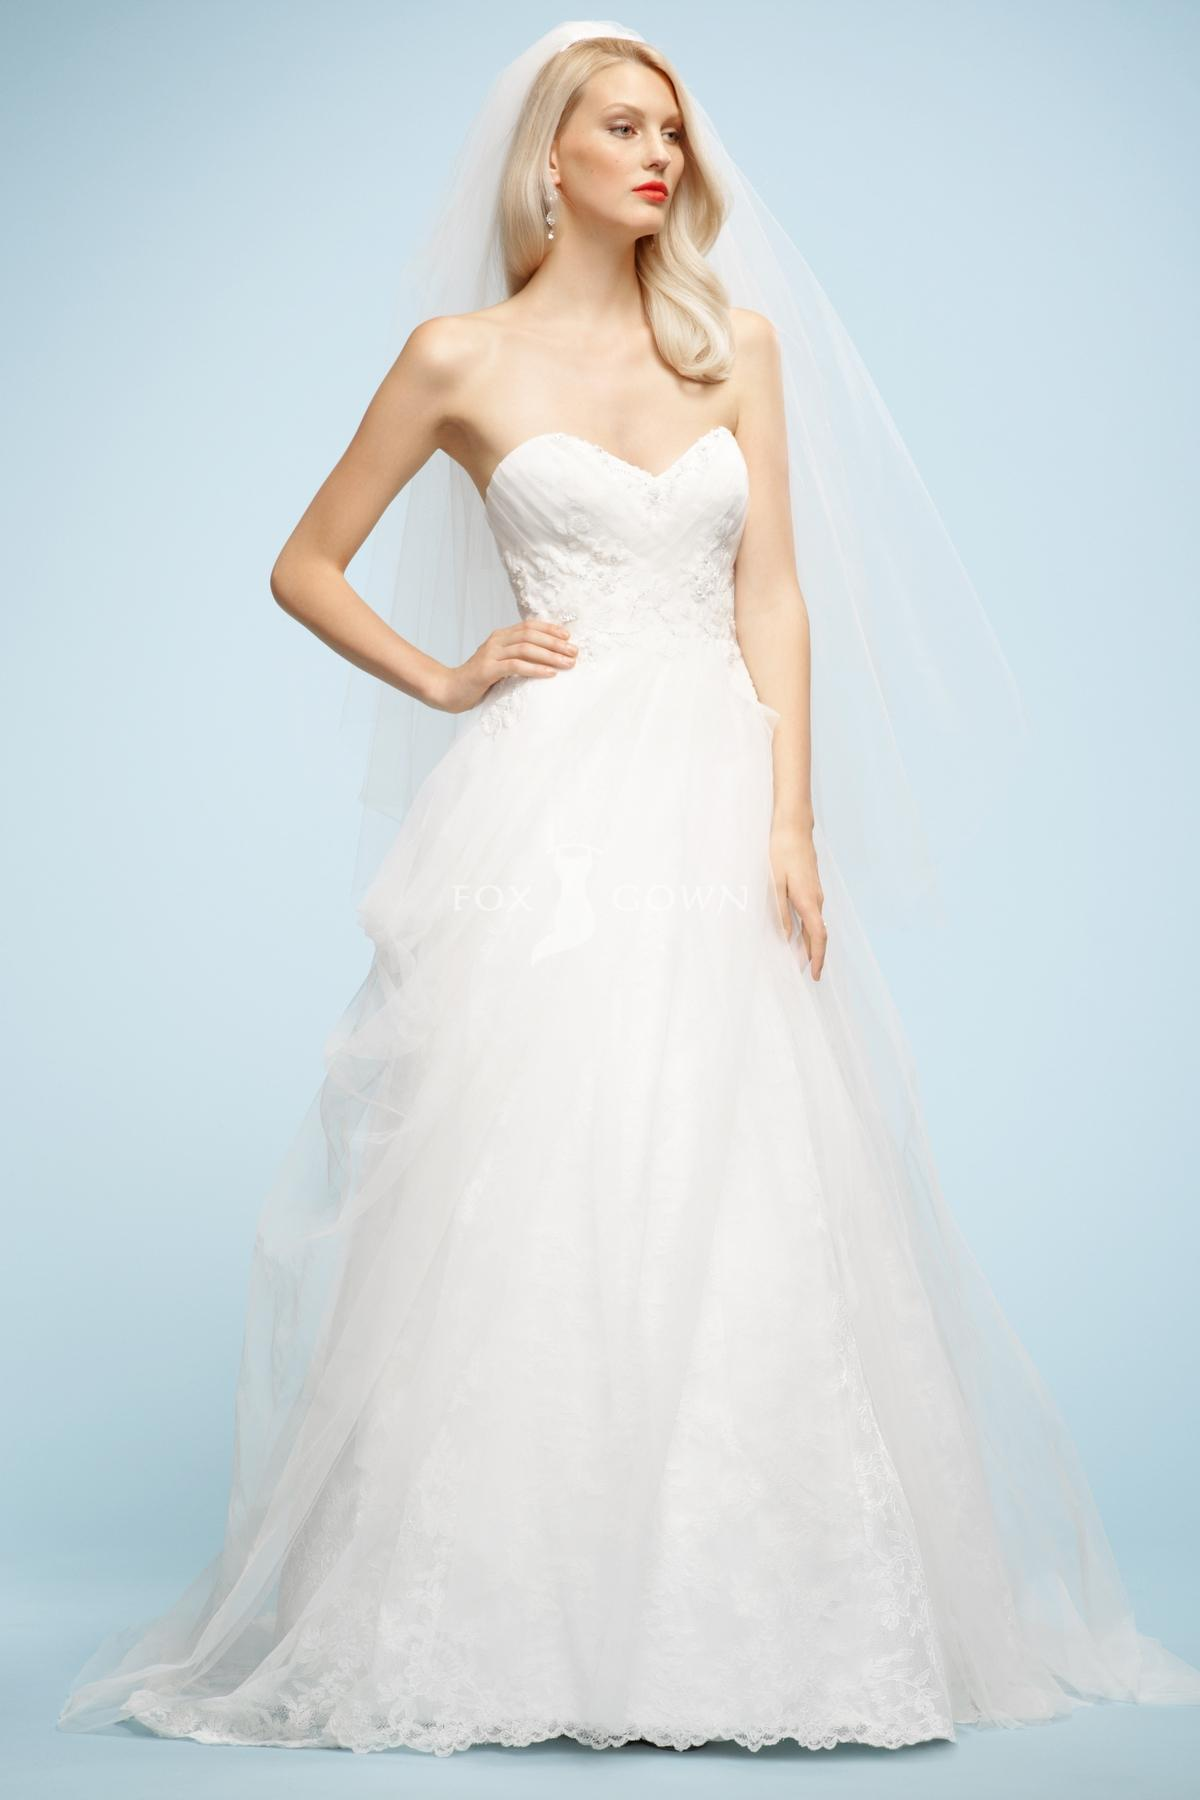 wedding dresses tulle skirt wedding dress skirt Lace And Tulle Dress